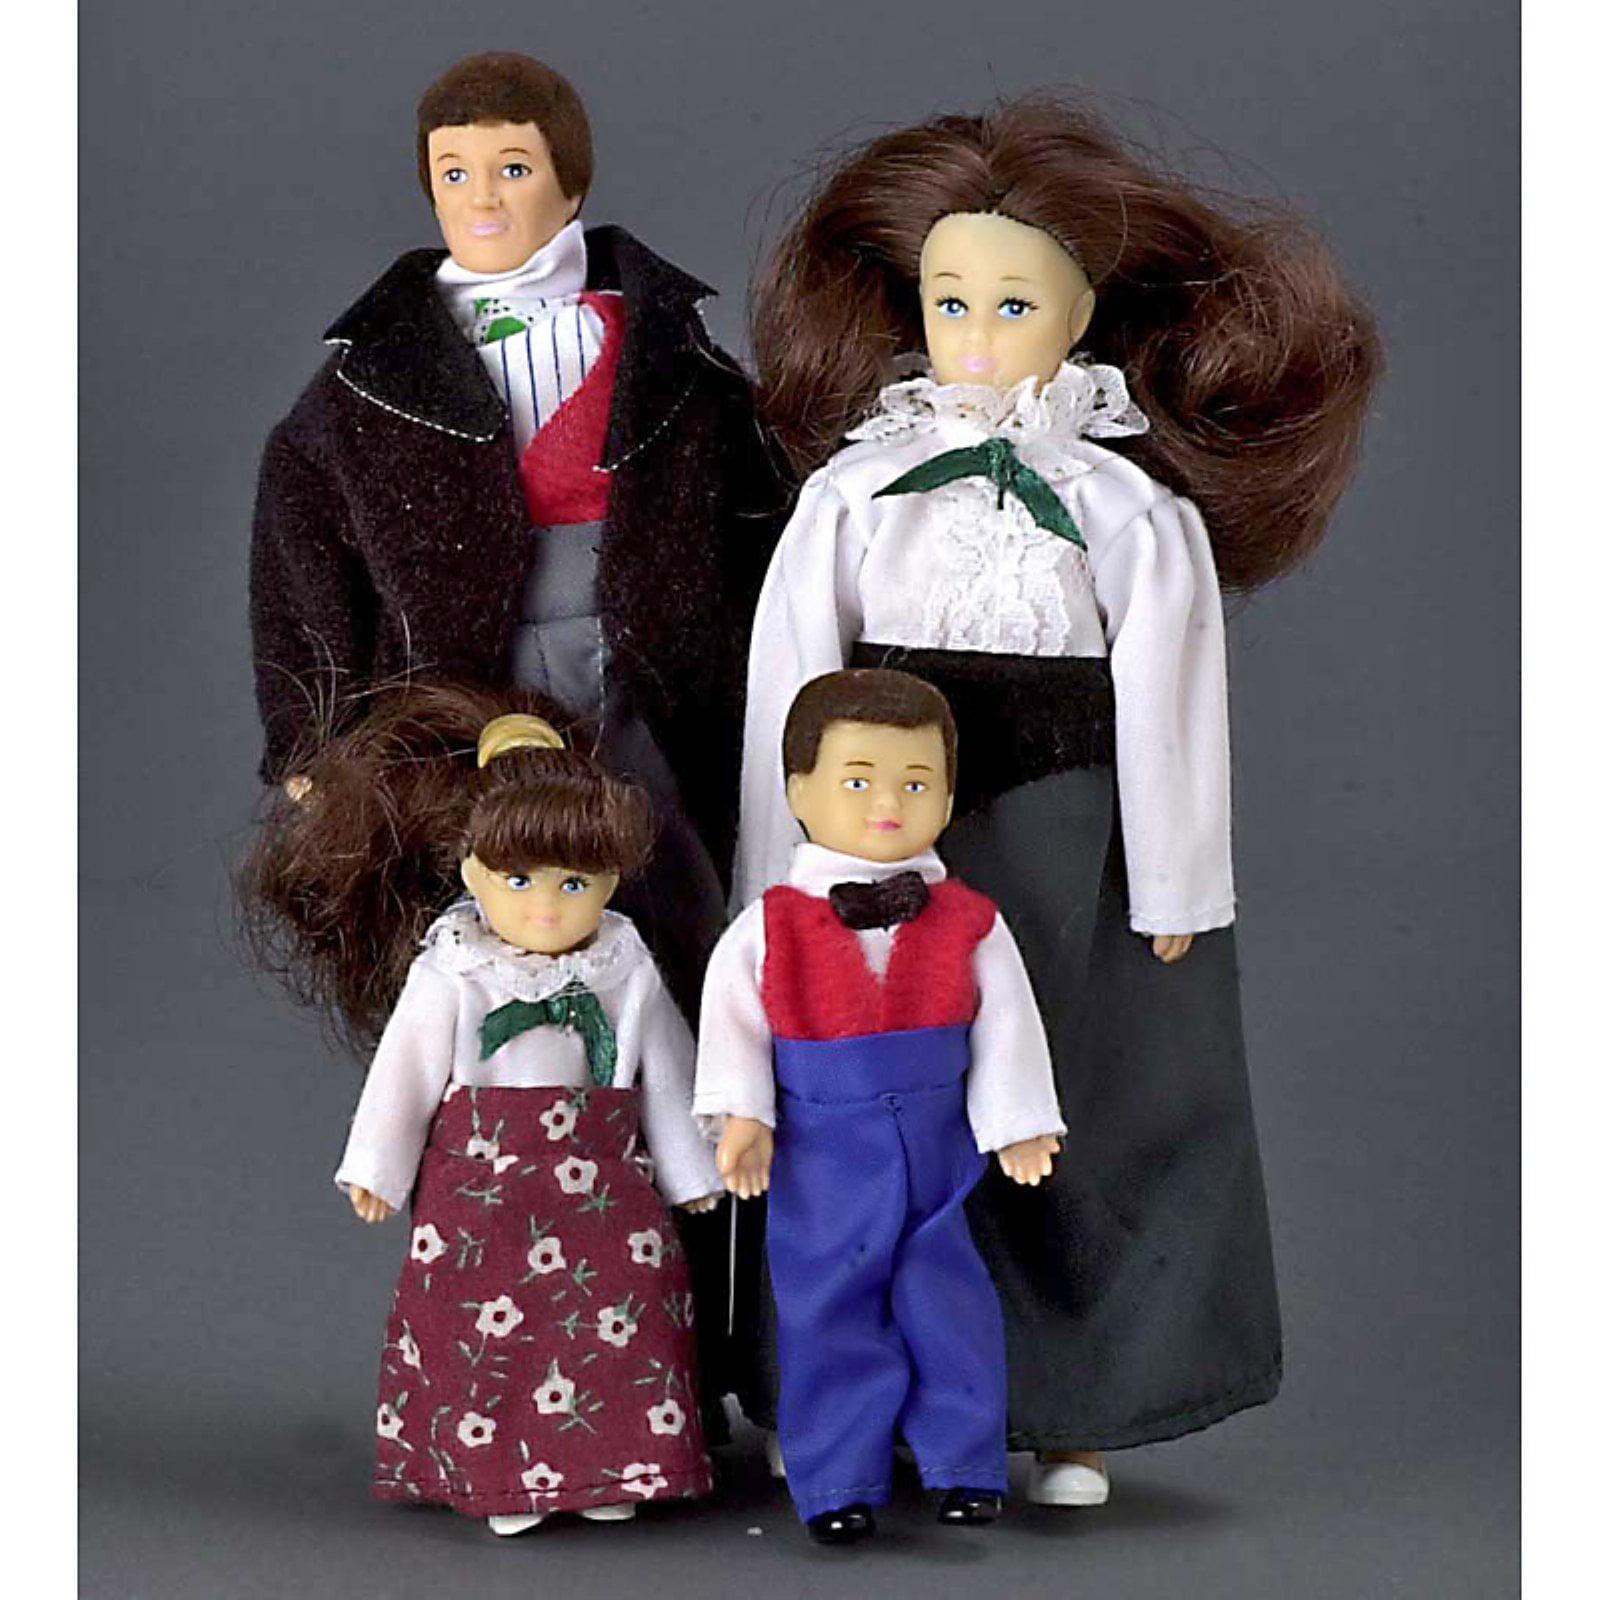 Victorian Brunette Doll Family of 4 Dollhouse Miniature Set